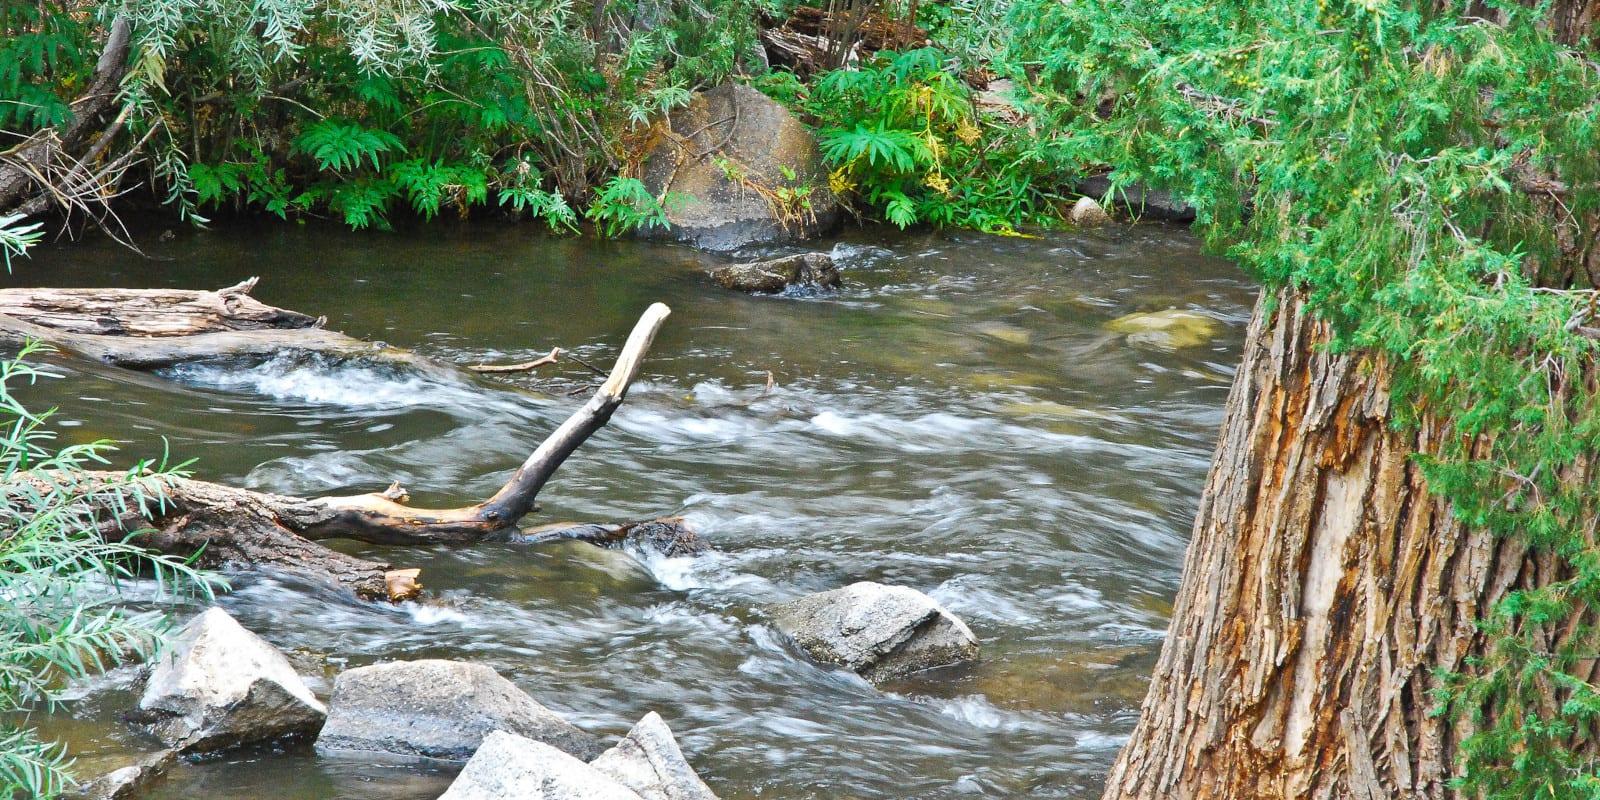 Image of the Cimarron River